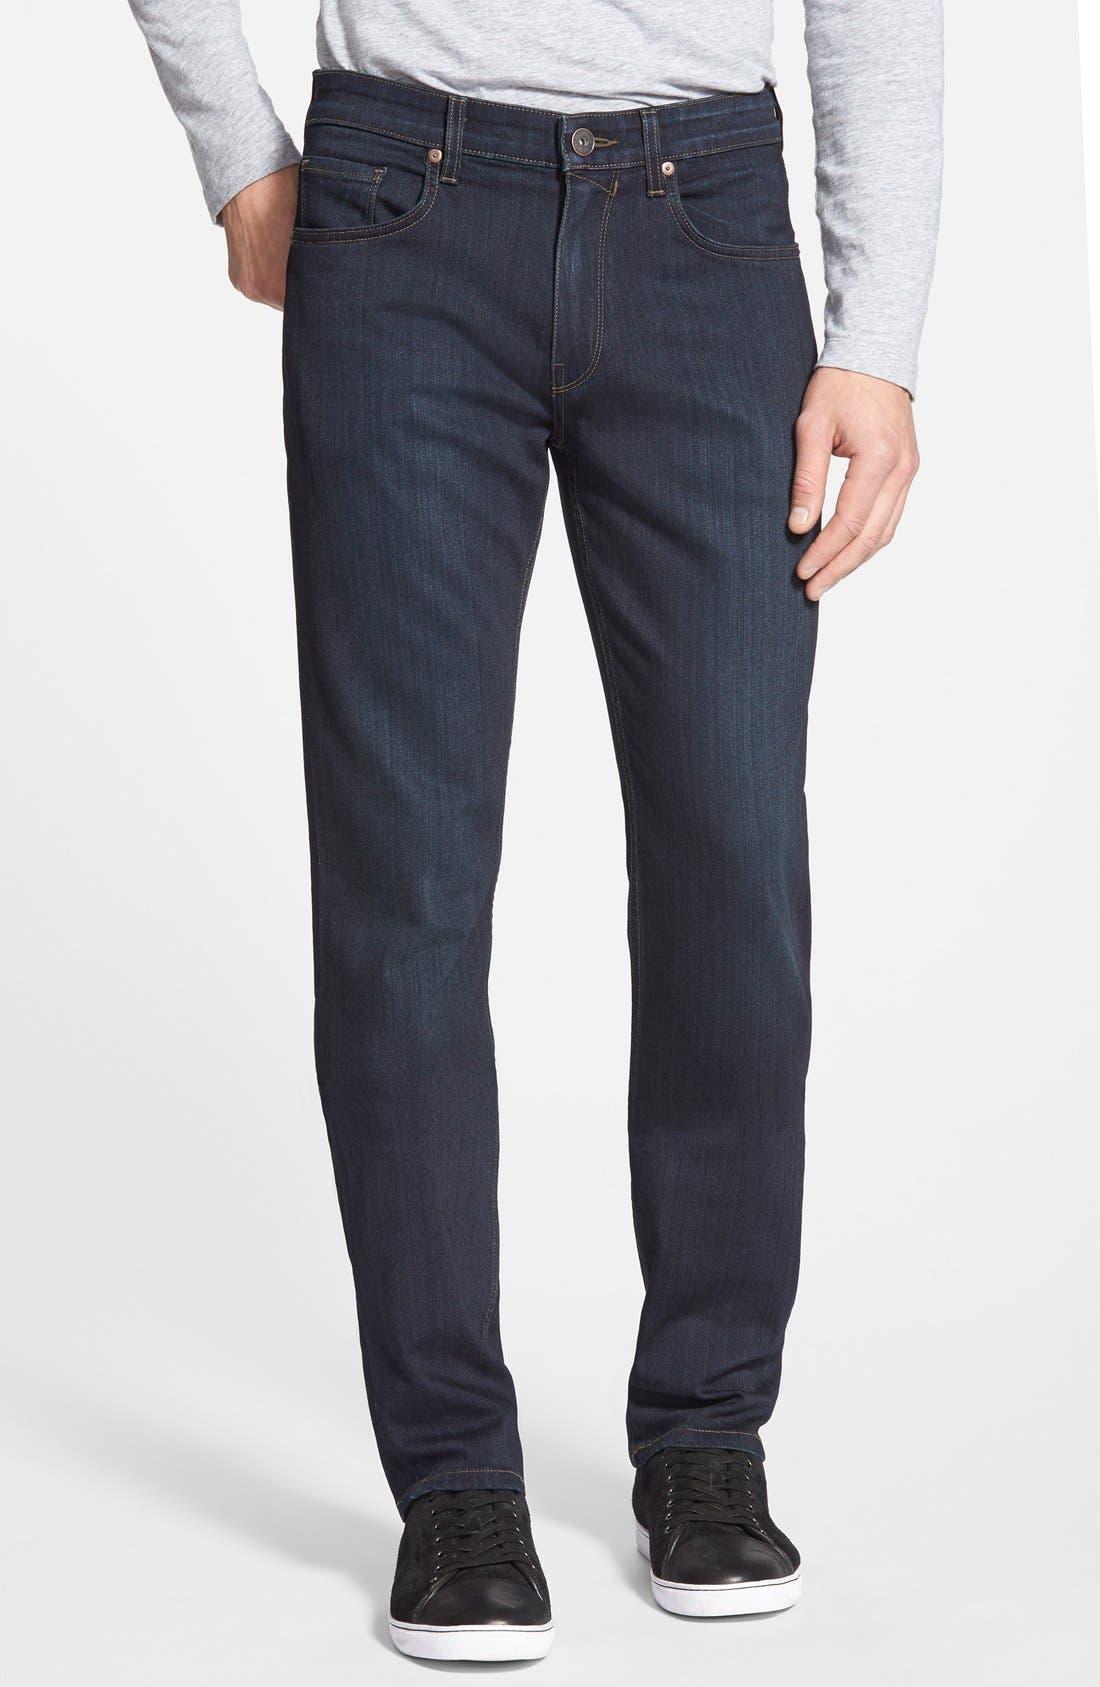 PAIGE Transcend - Federal Slim Straight Leg Jeans